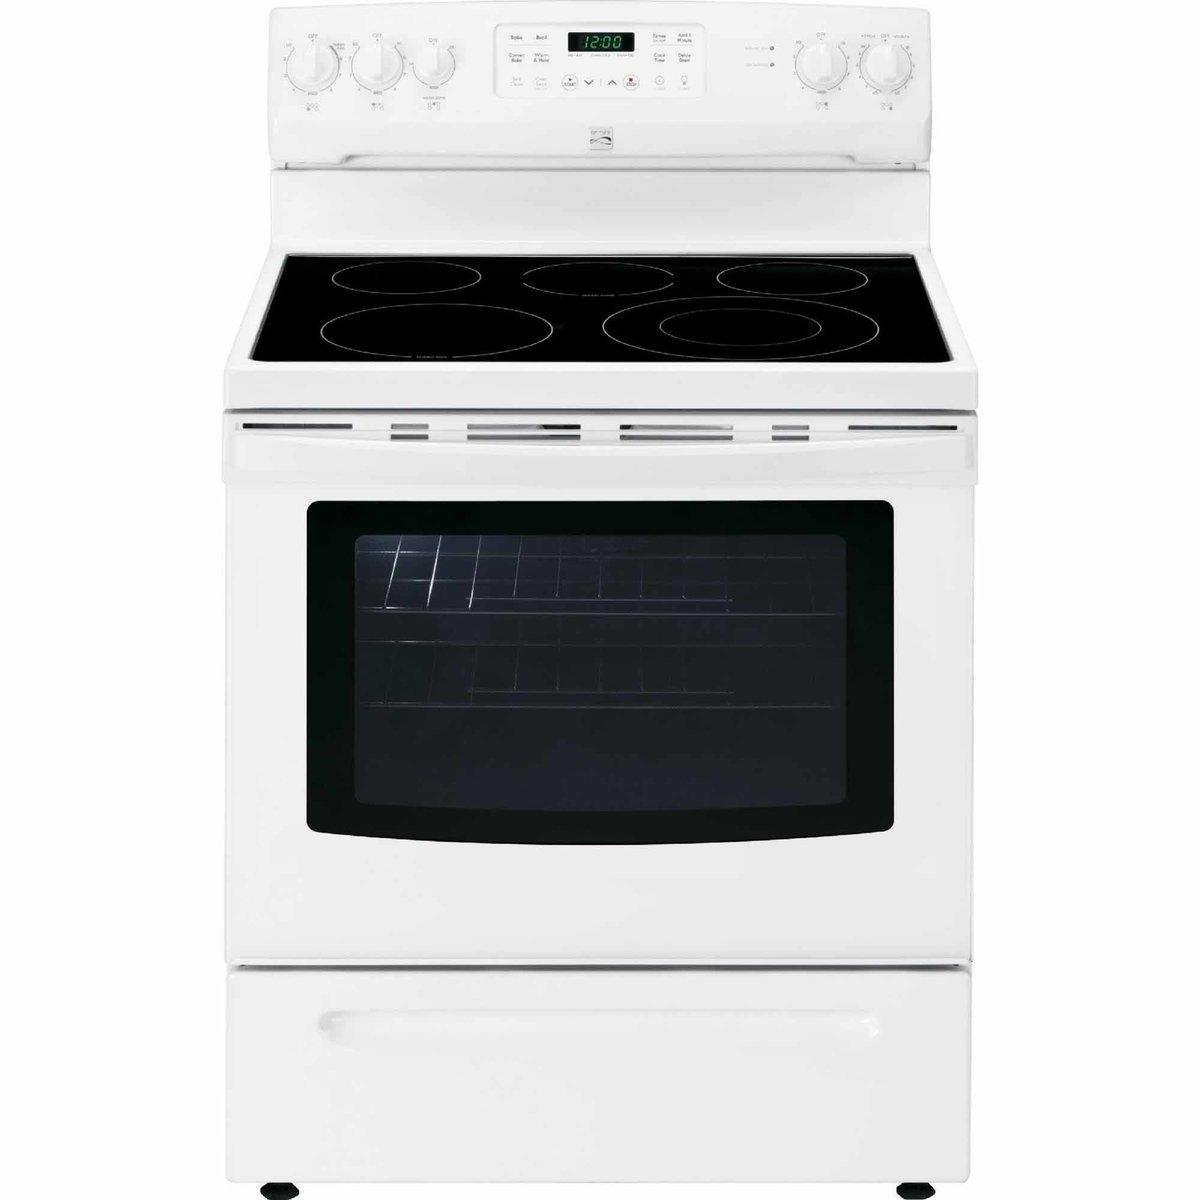 Amazon.com: Kenmore 2294199 2294192 02294192 Self Clean Electric Range, 5.4  cu ft, White: Appliances